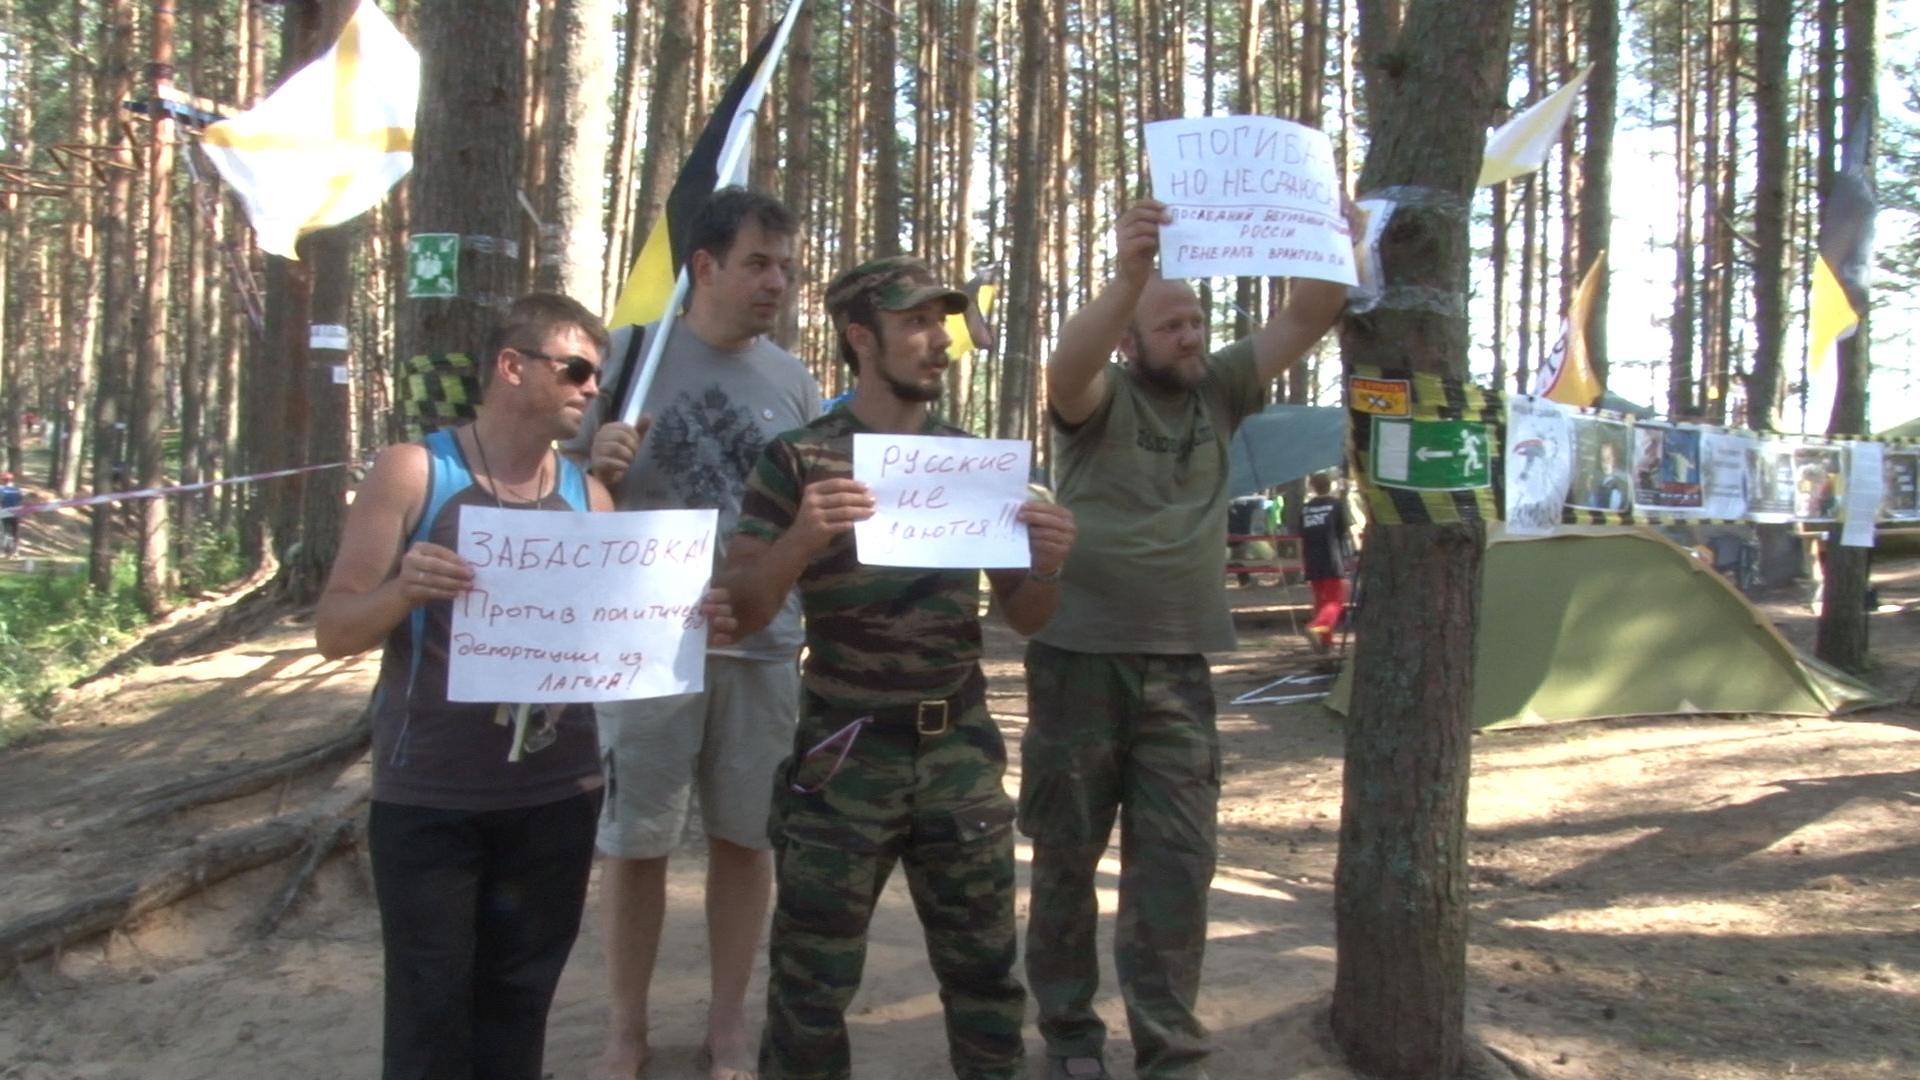 Бунт националистов на Селигере перед приездом Путина #селигер2012